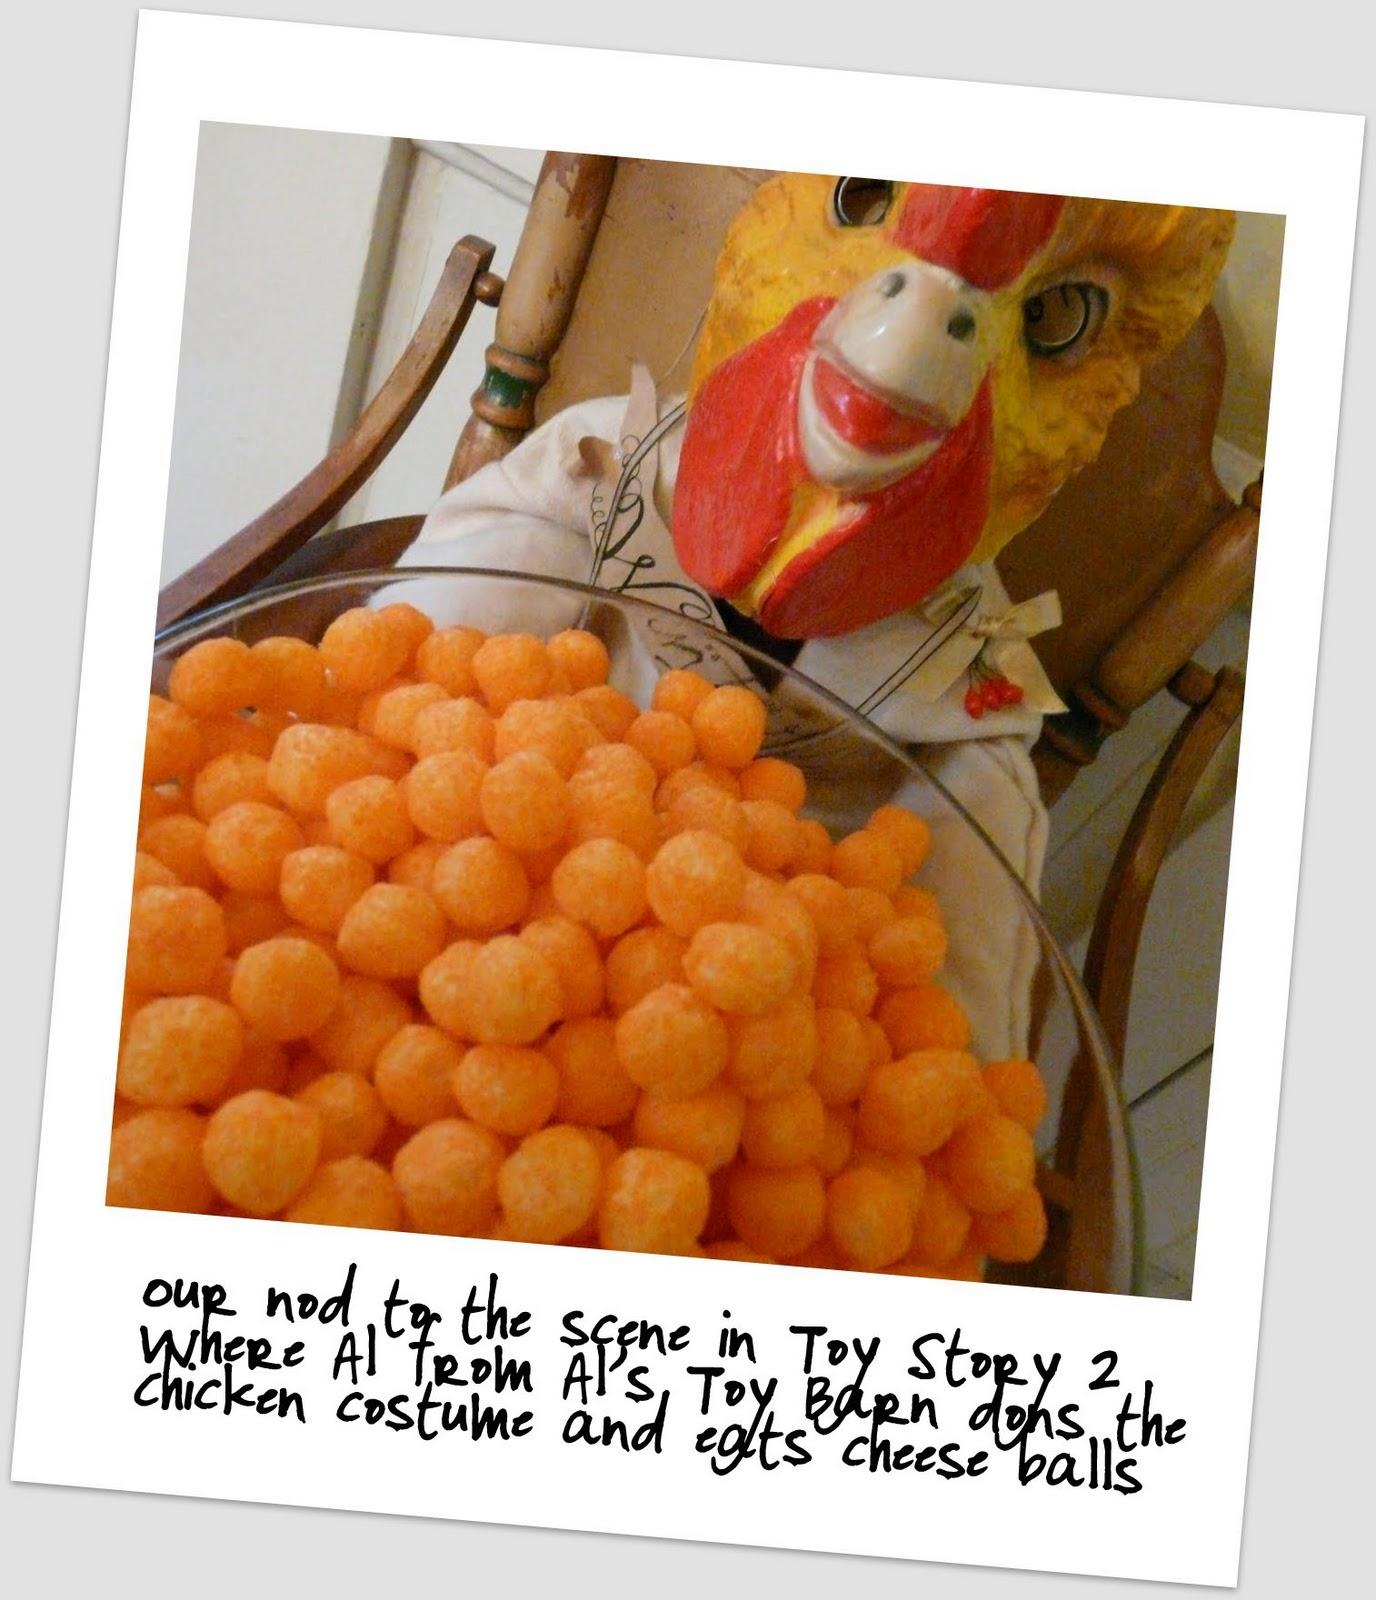 http://2.bp.blogspot.com/_FEZc22SfAy4/TUoZfNLDZMI/AAAAAAAAEQ8/UX9NzXQCGK0/s1600/Toy_Story_Birthday_Party%2B005%2B%2525282%252529.JPG